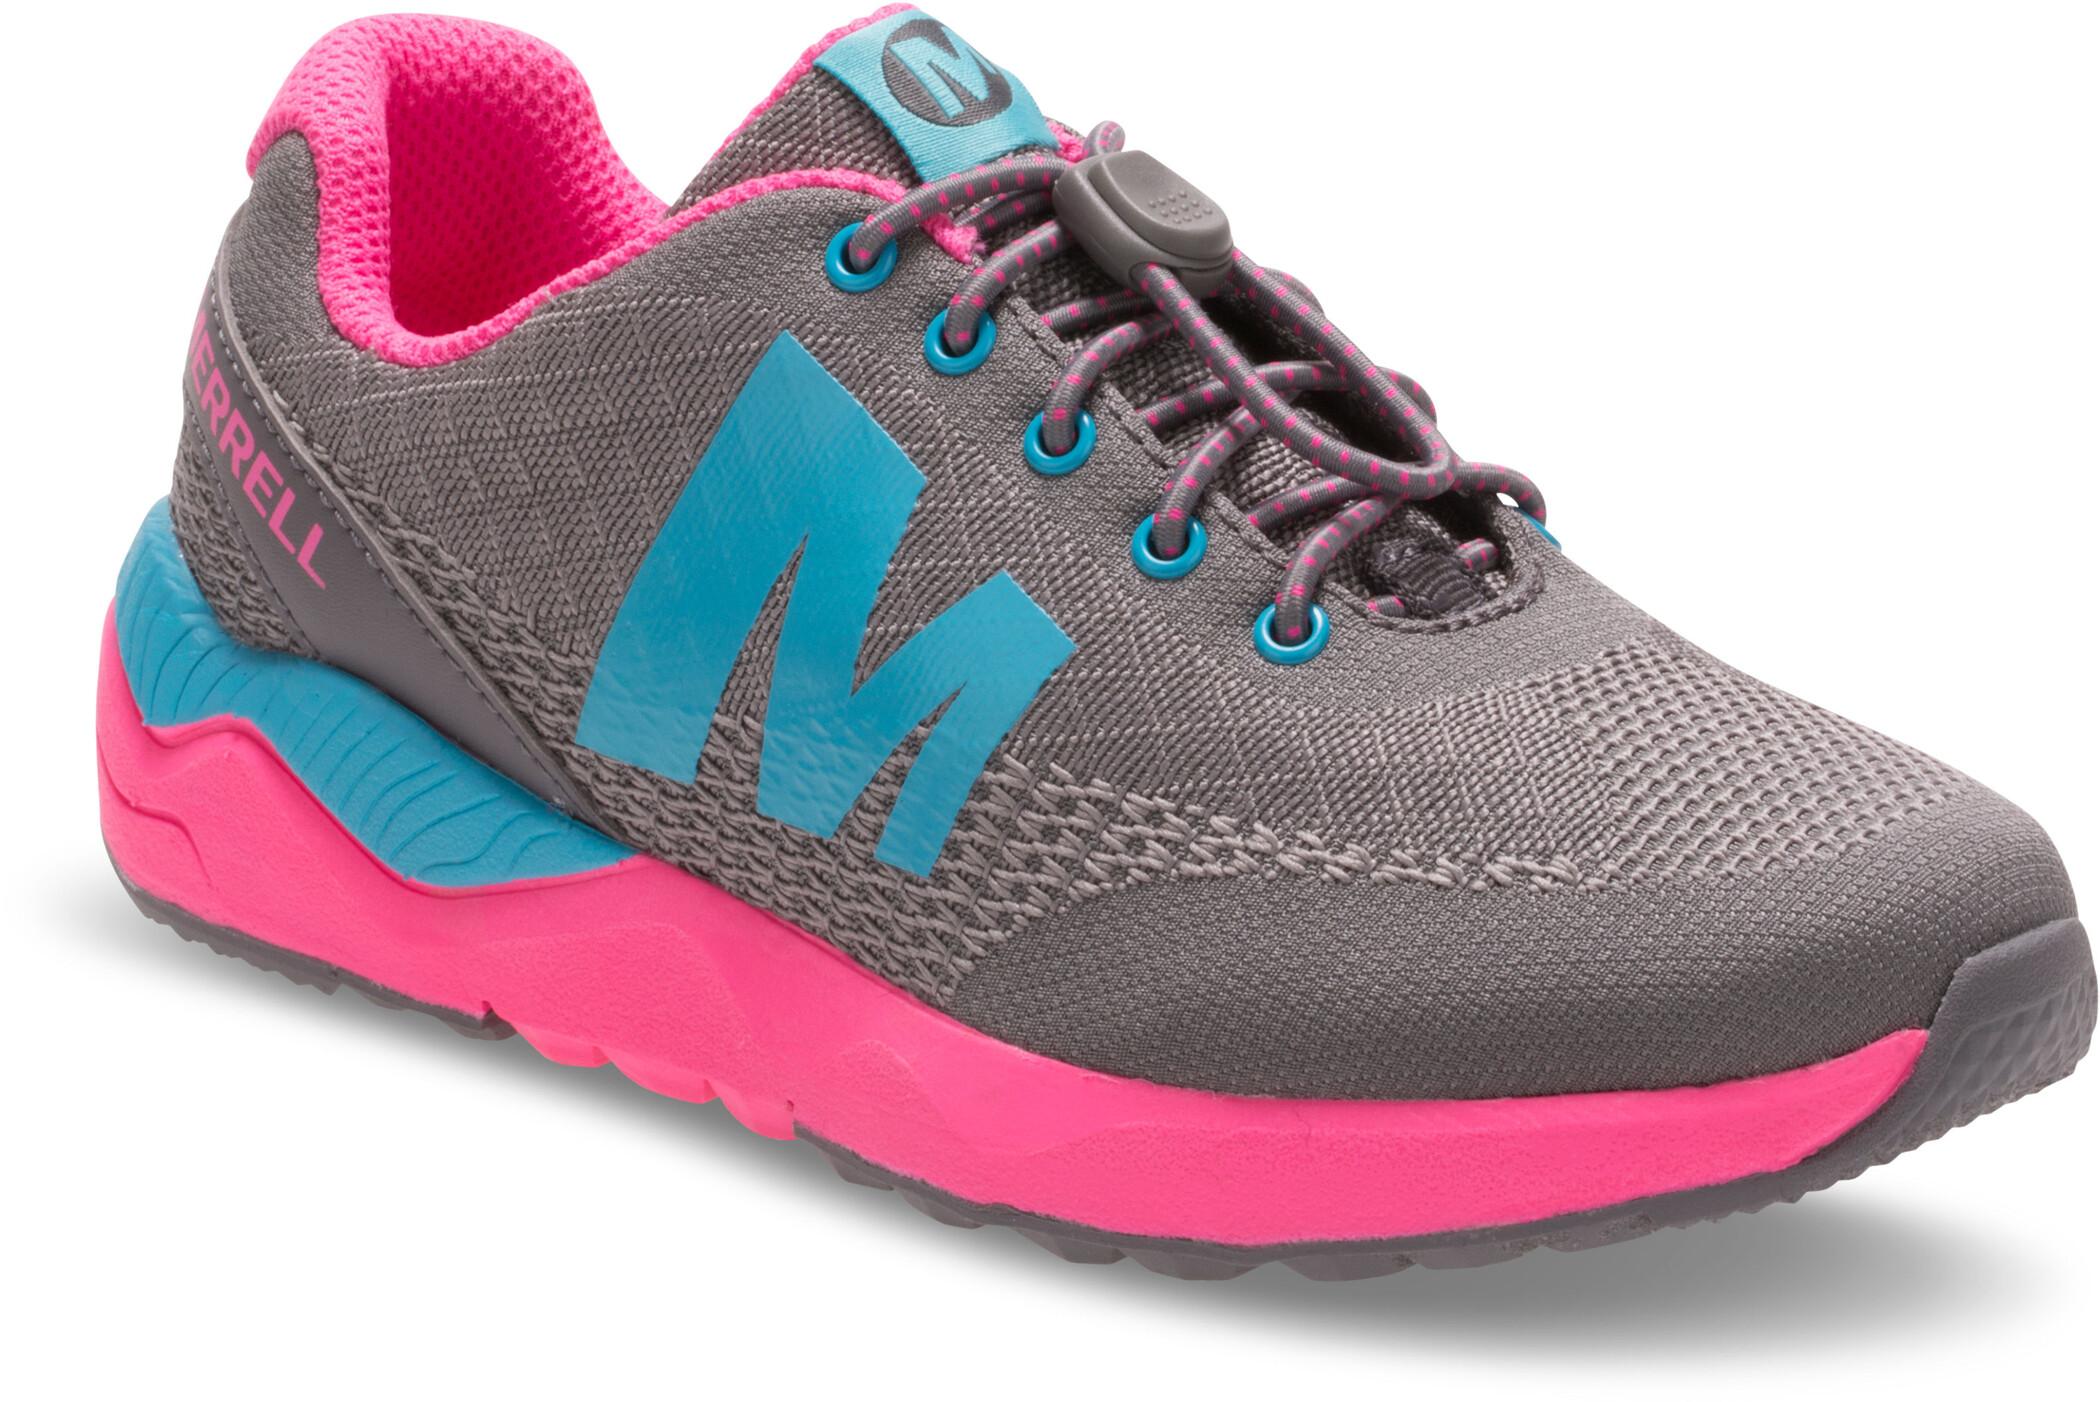 the latest 19ce3 ee803 Merrell Versent Shoes Girls grey pink turq.jpg